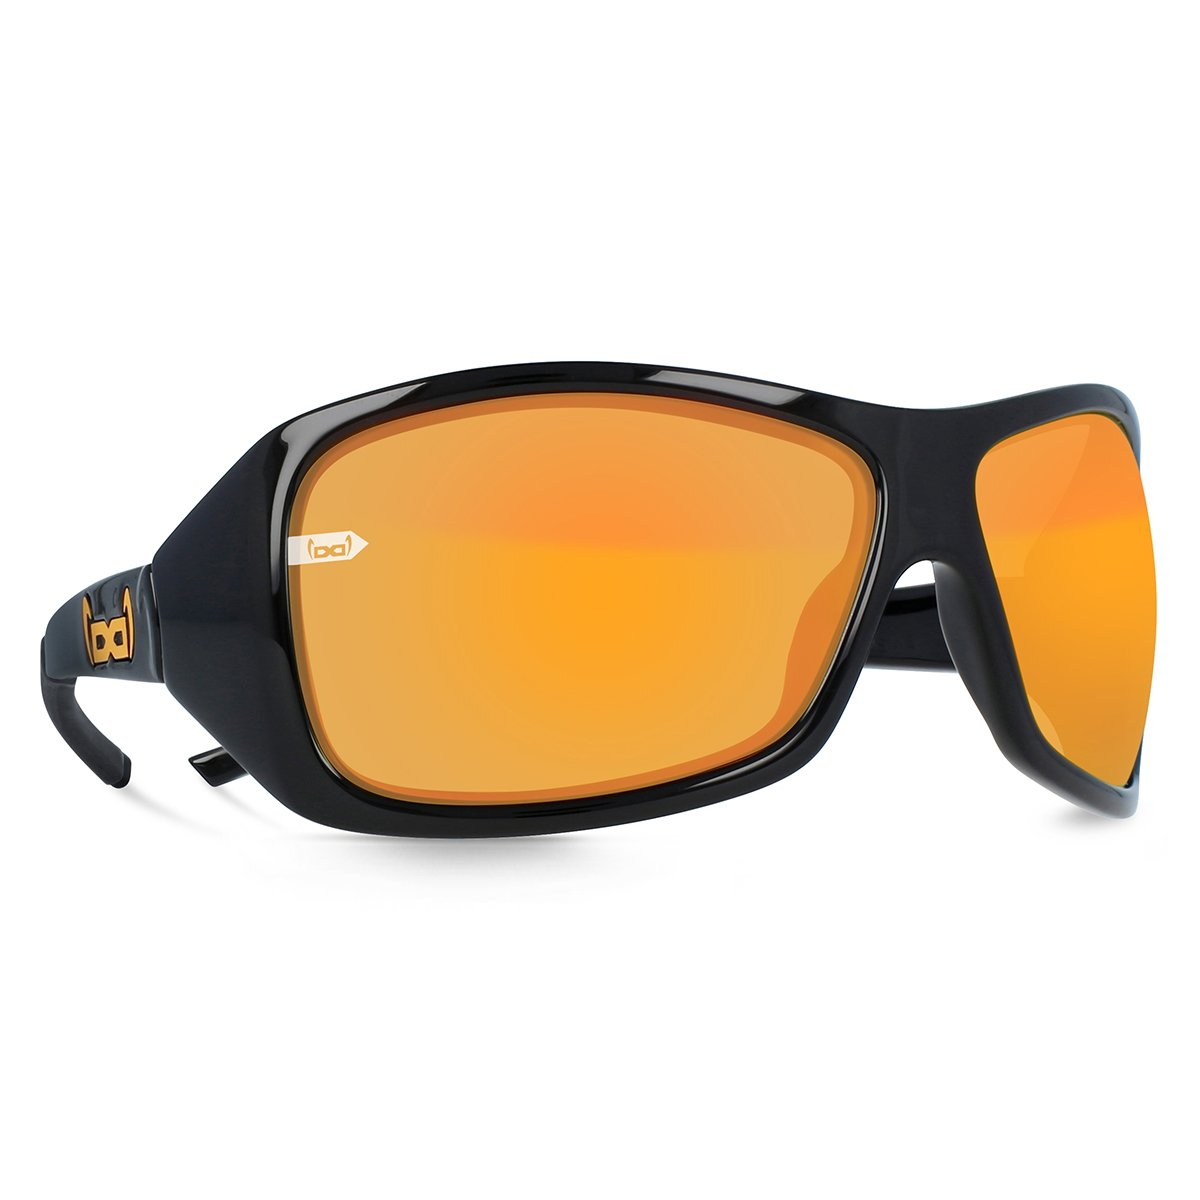 Gloryfy unbreakable eyewear Sonnenbrille G10 happyday, schwarz